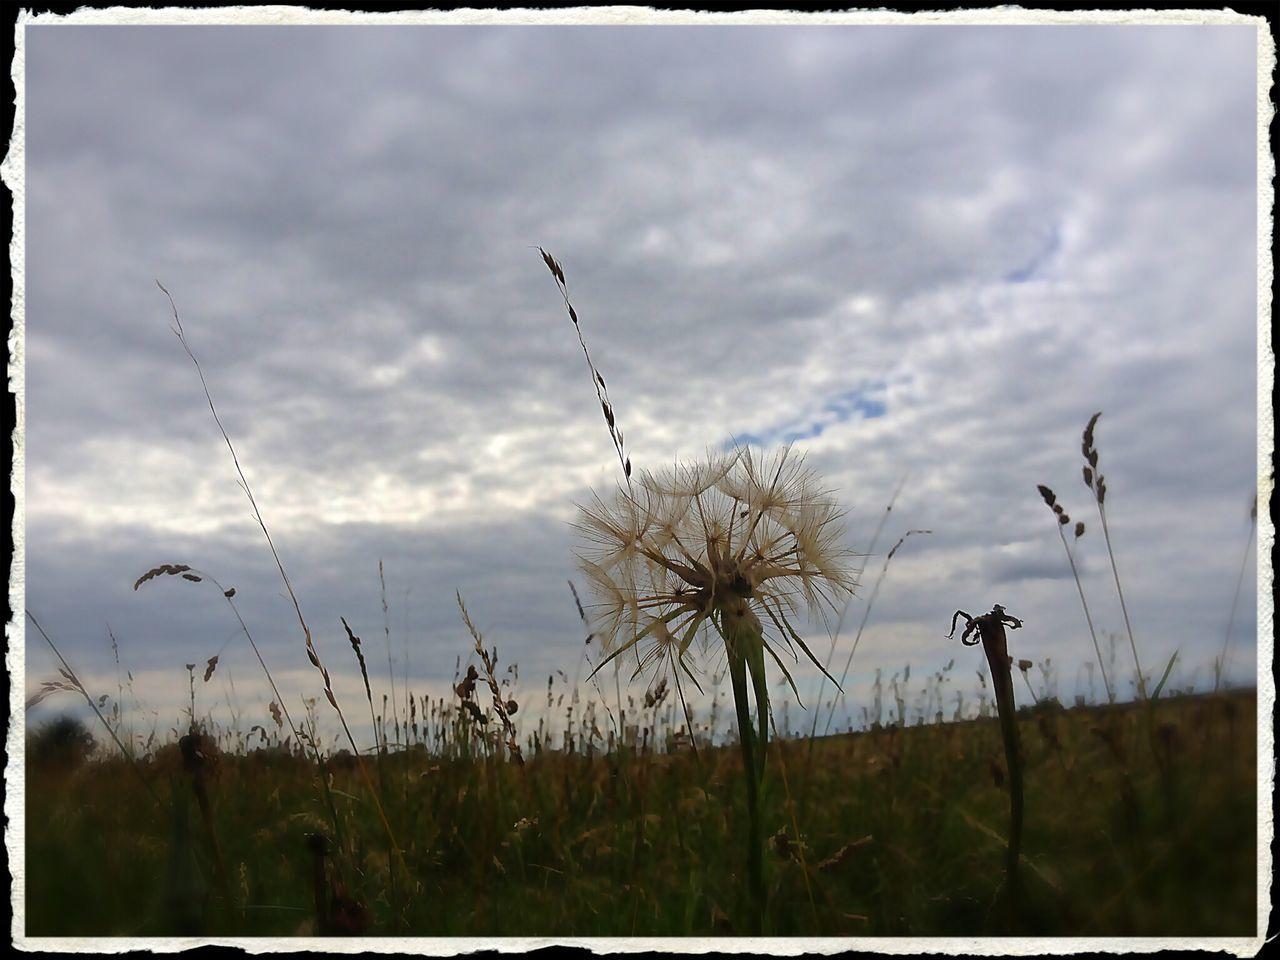 Dandelion on field against cloudy sky